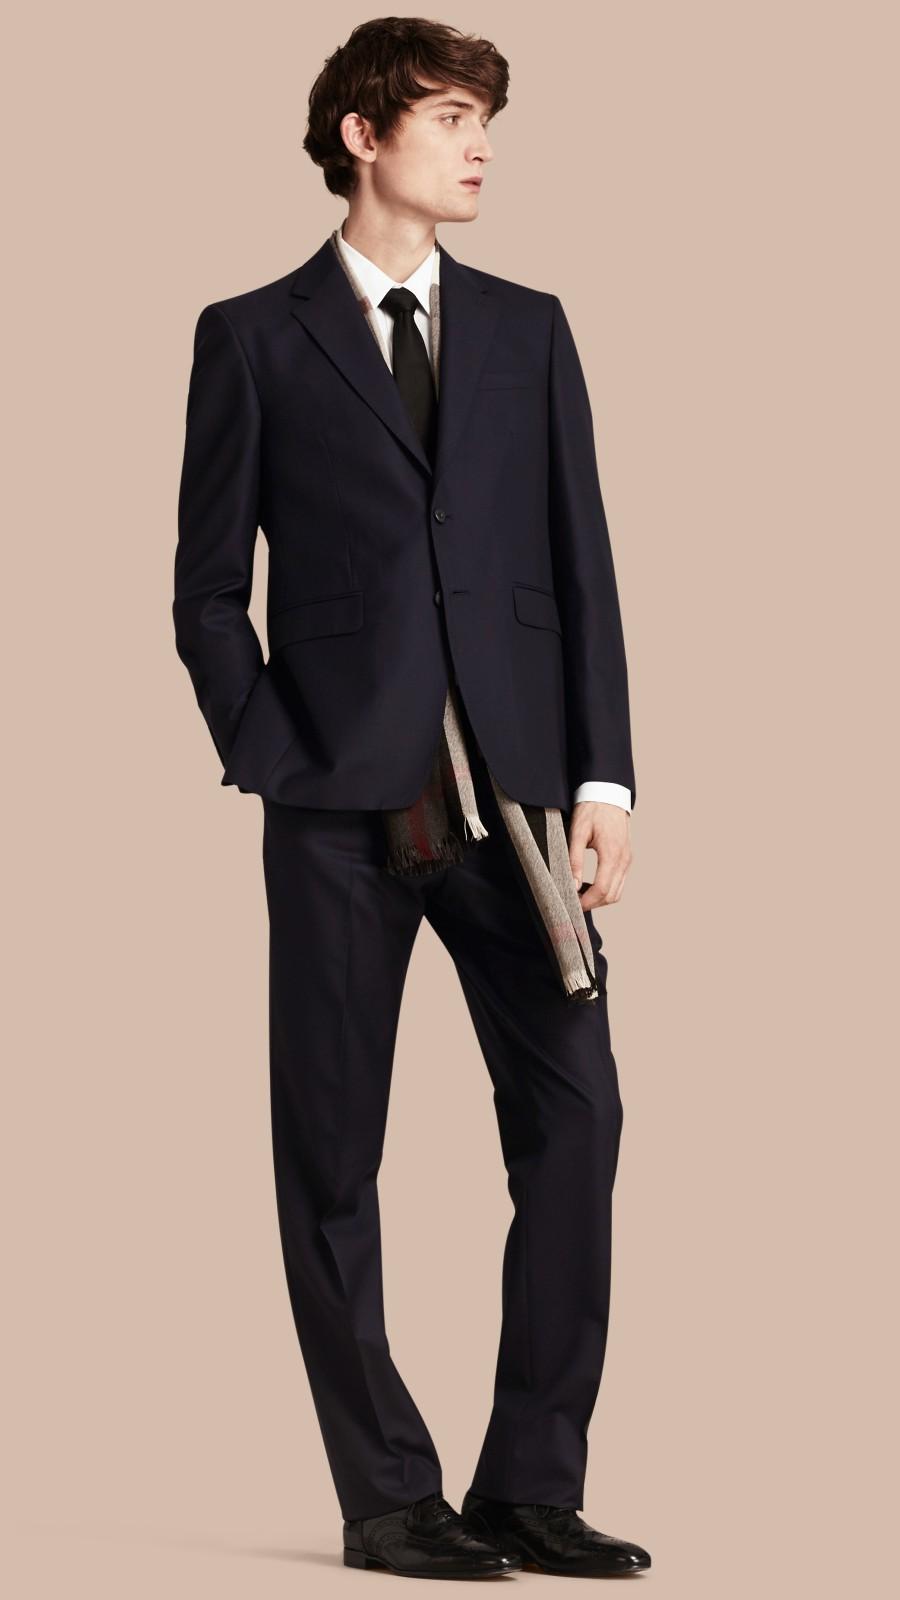 Navy Classic Fit Wool Part-canvas Suit Navy - Image 1